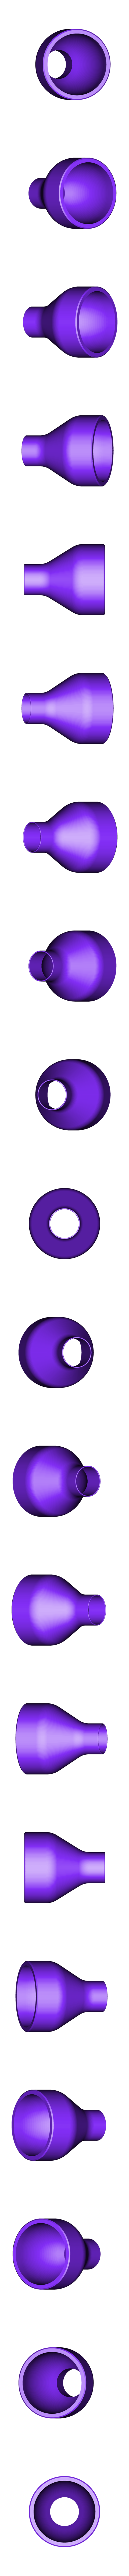 Bottom.stl Download free STL file Resin filter funnel using strainer • 3D printing object, 3D-Designs